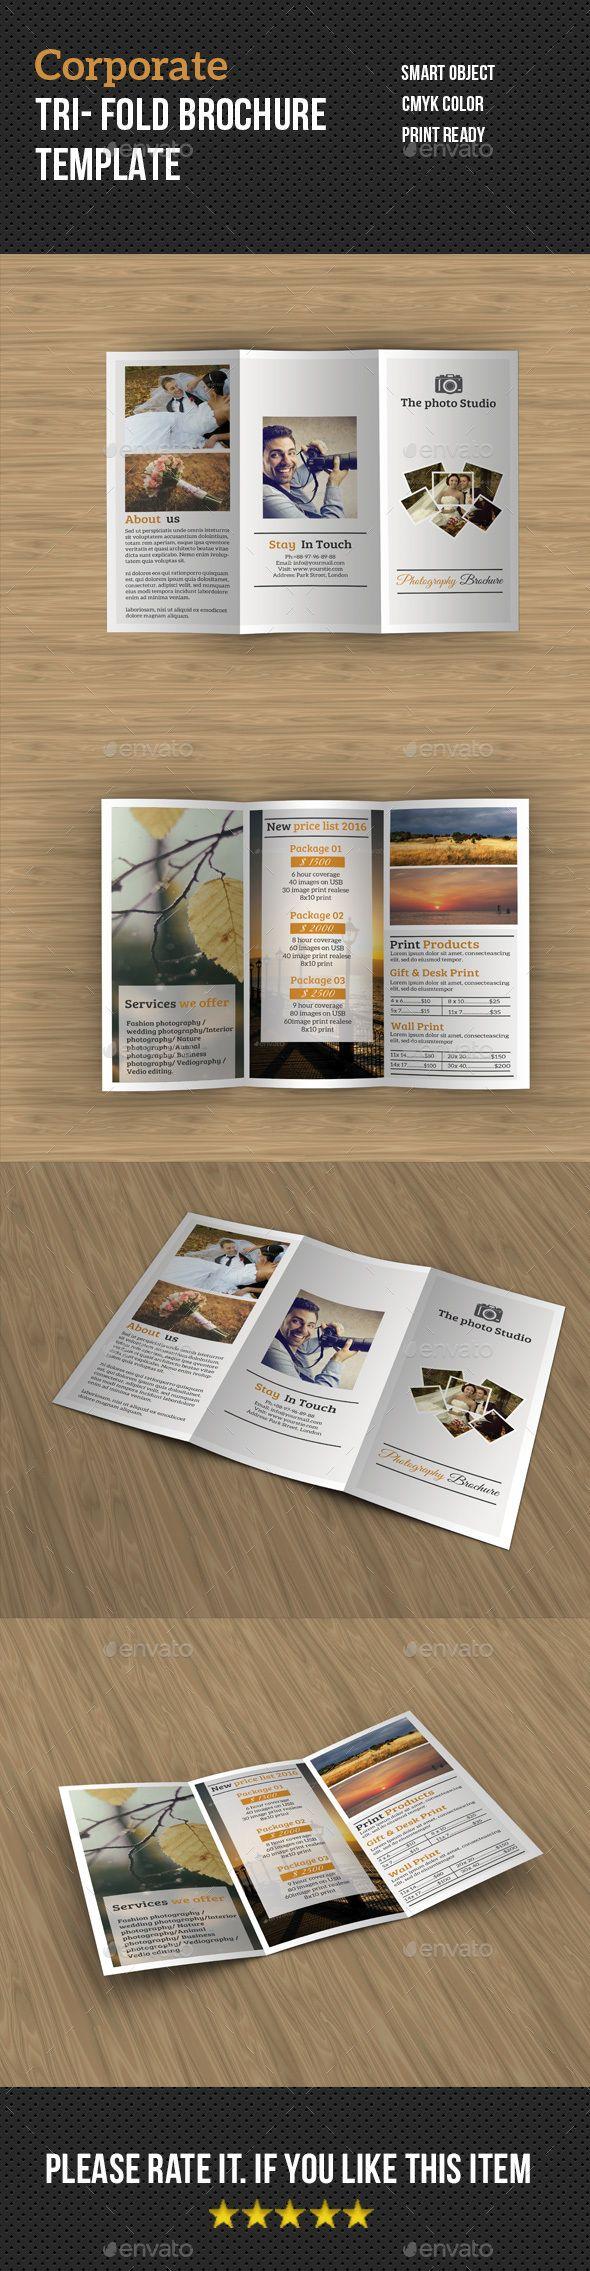 Photography Tri Fold Brochure Psd Template Corporate Brochure